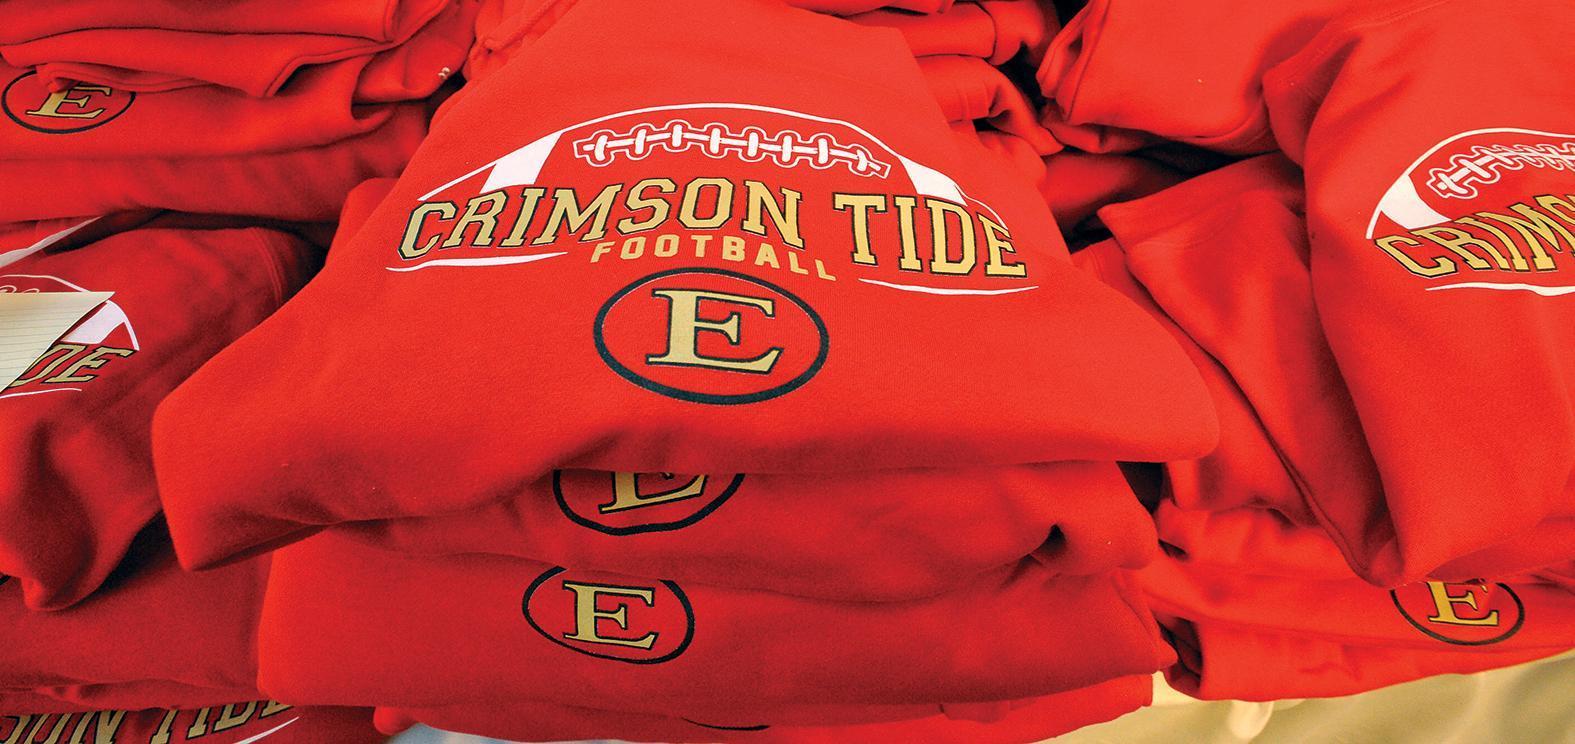 Crimson Tide Football Sweatshirts